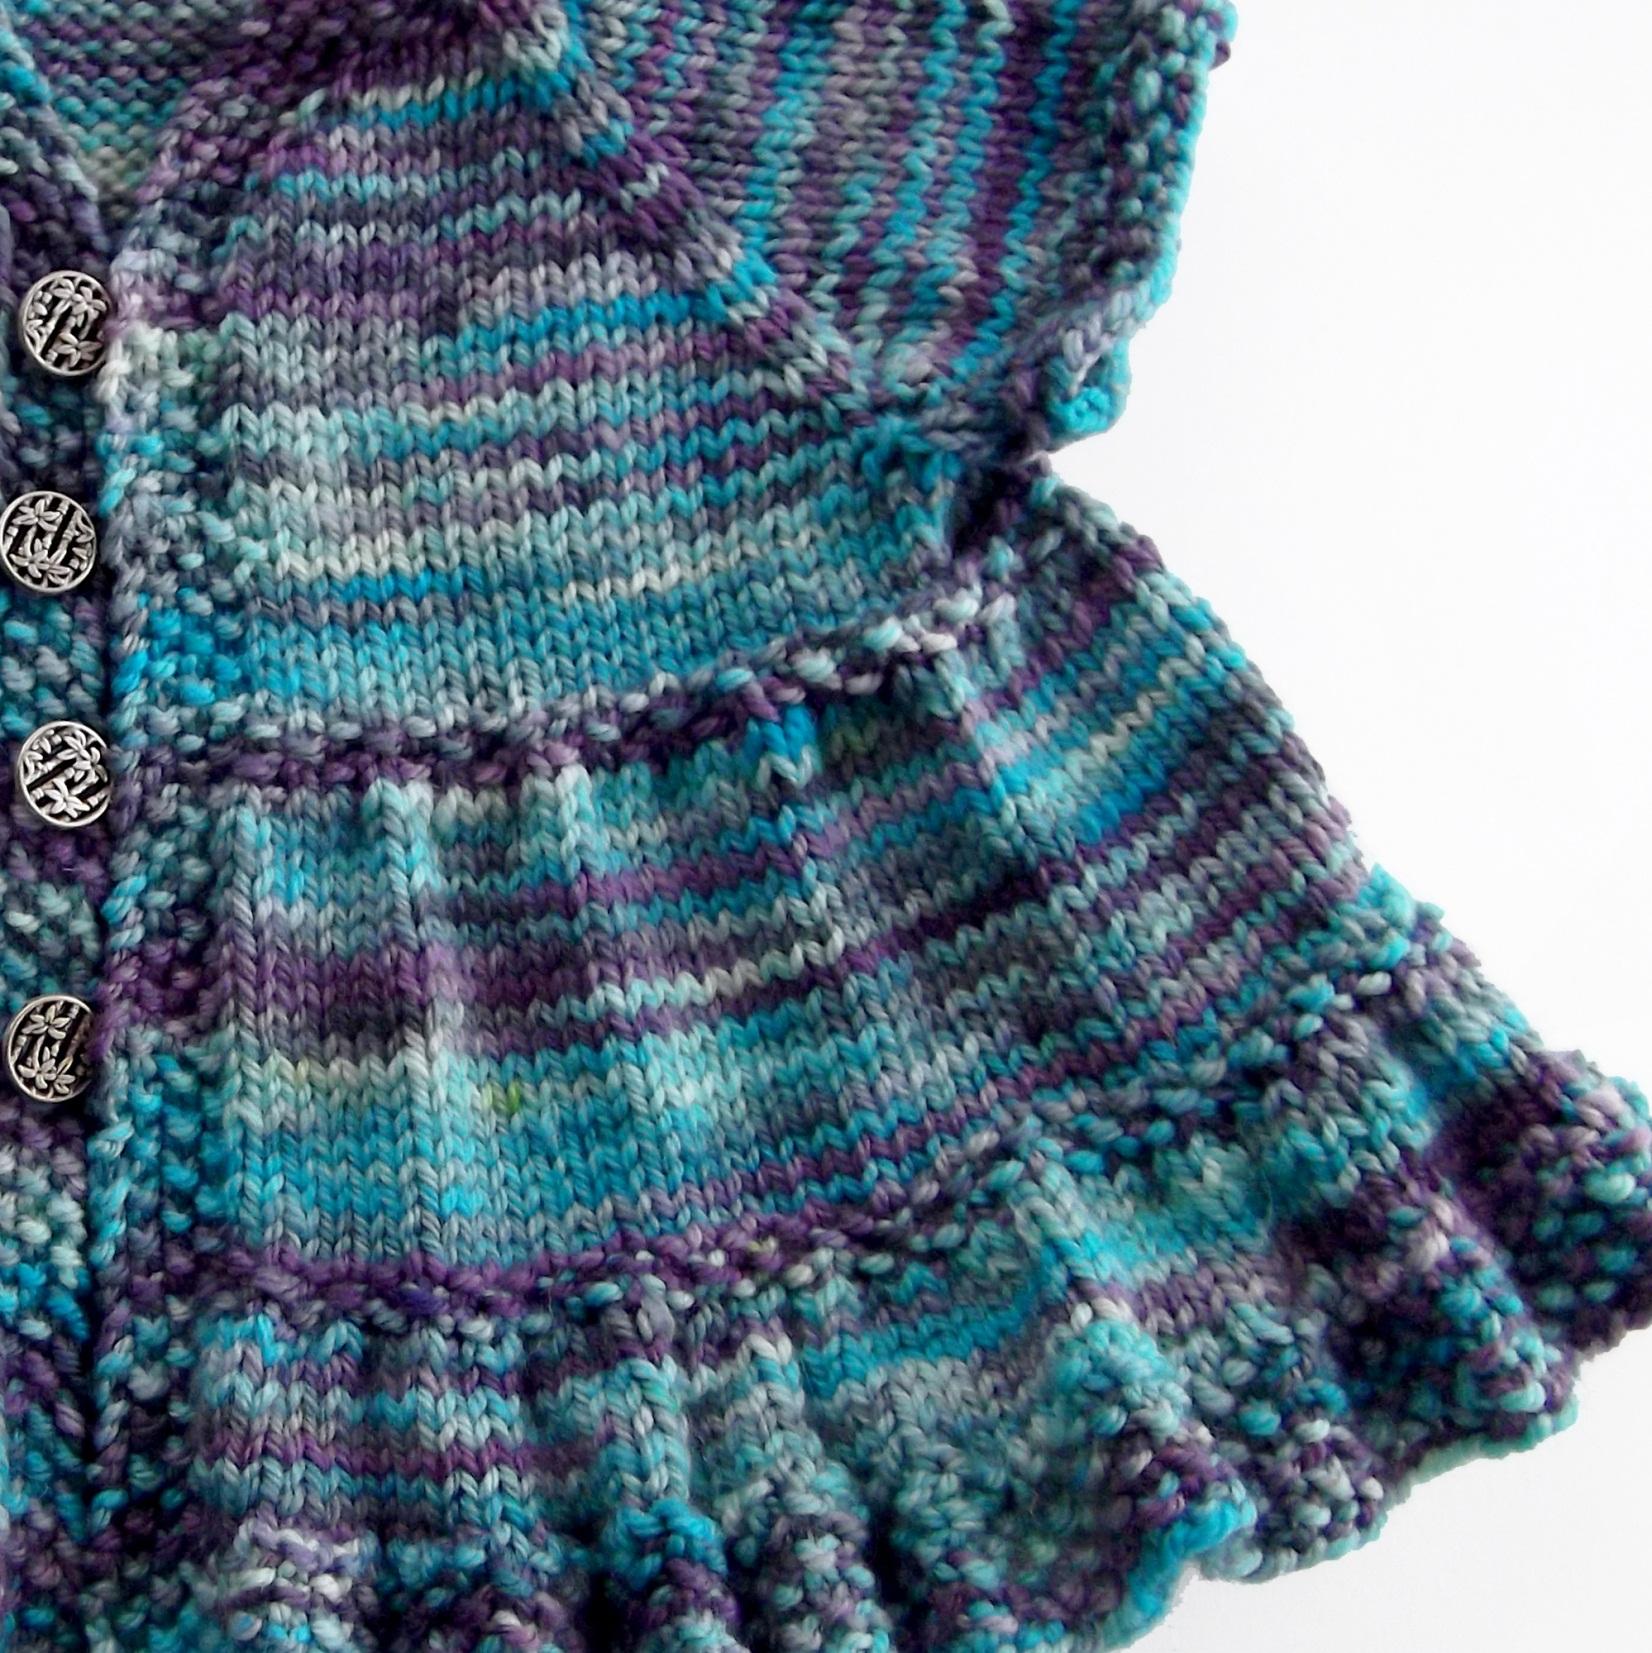 Knitting Dress Patterns For Babies : Smashwords ruffle dress baby knitting pattern a book